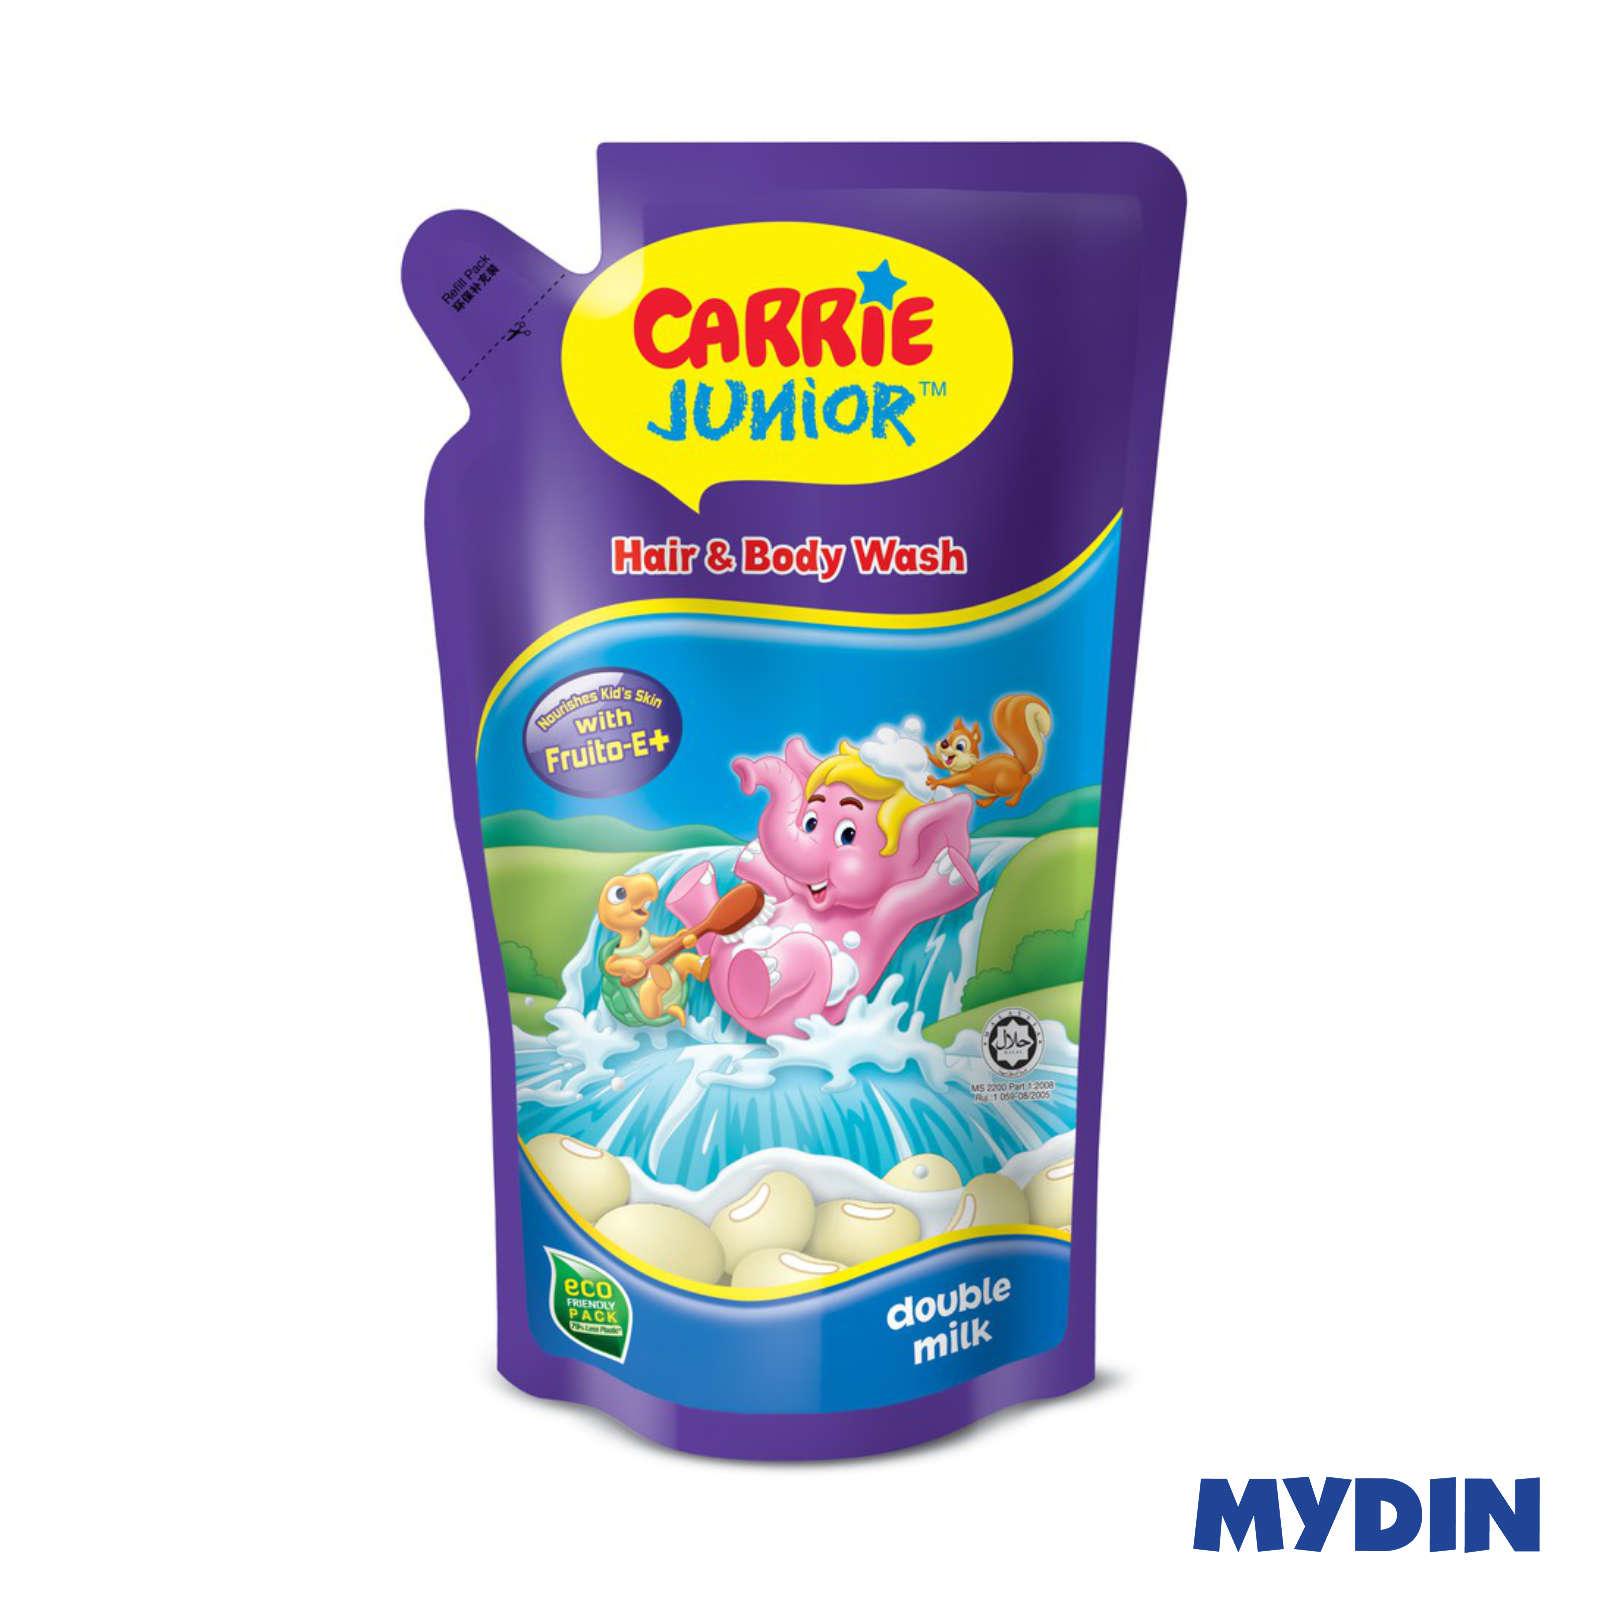 Carrie Junior Hair & Body Wash Double Milk 500g